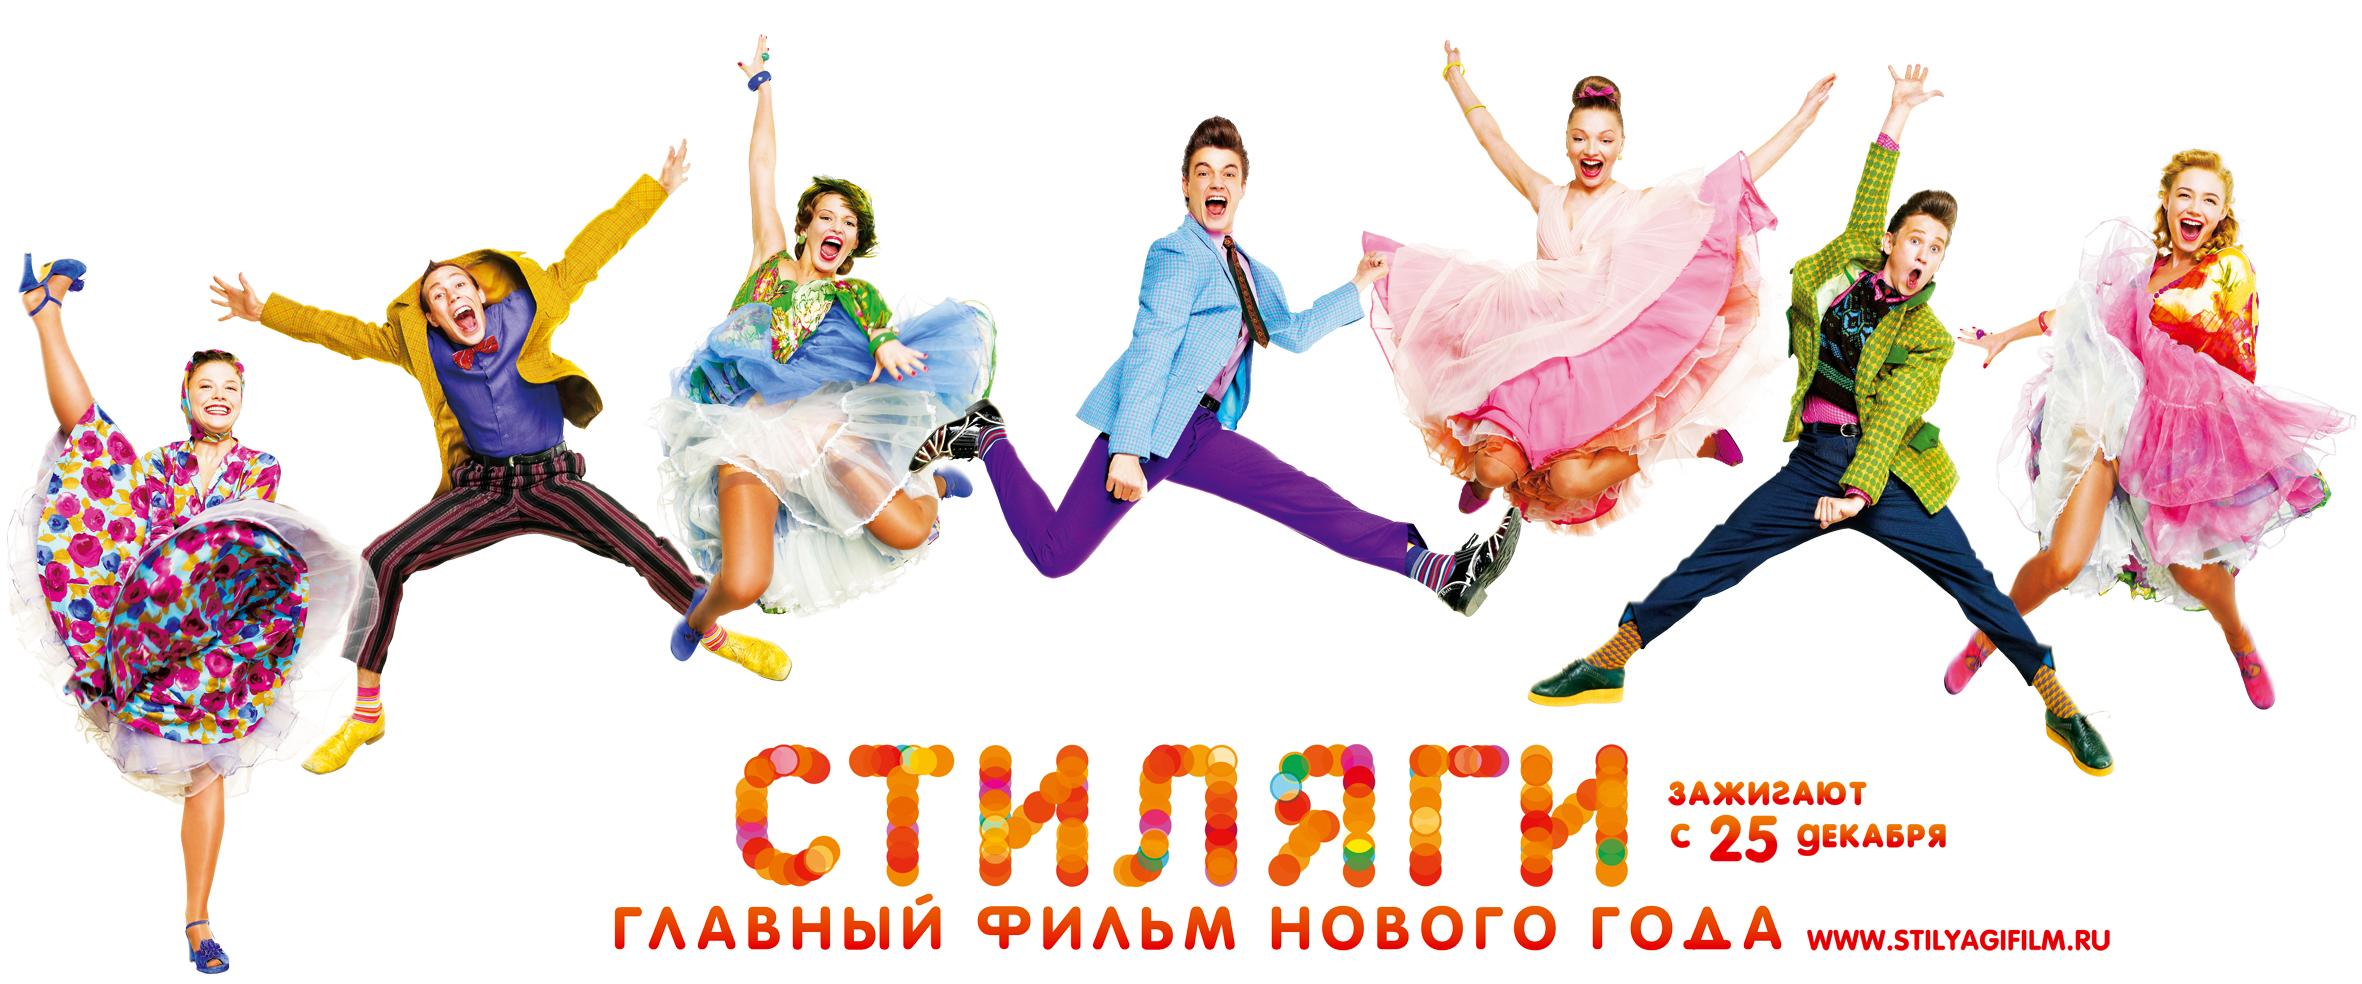 Стиляги, постер № 6